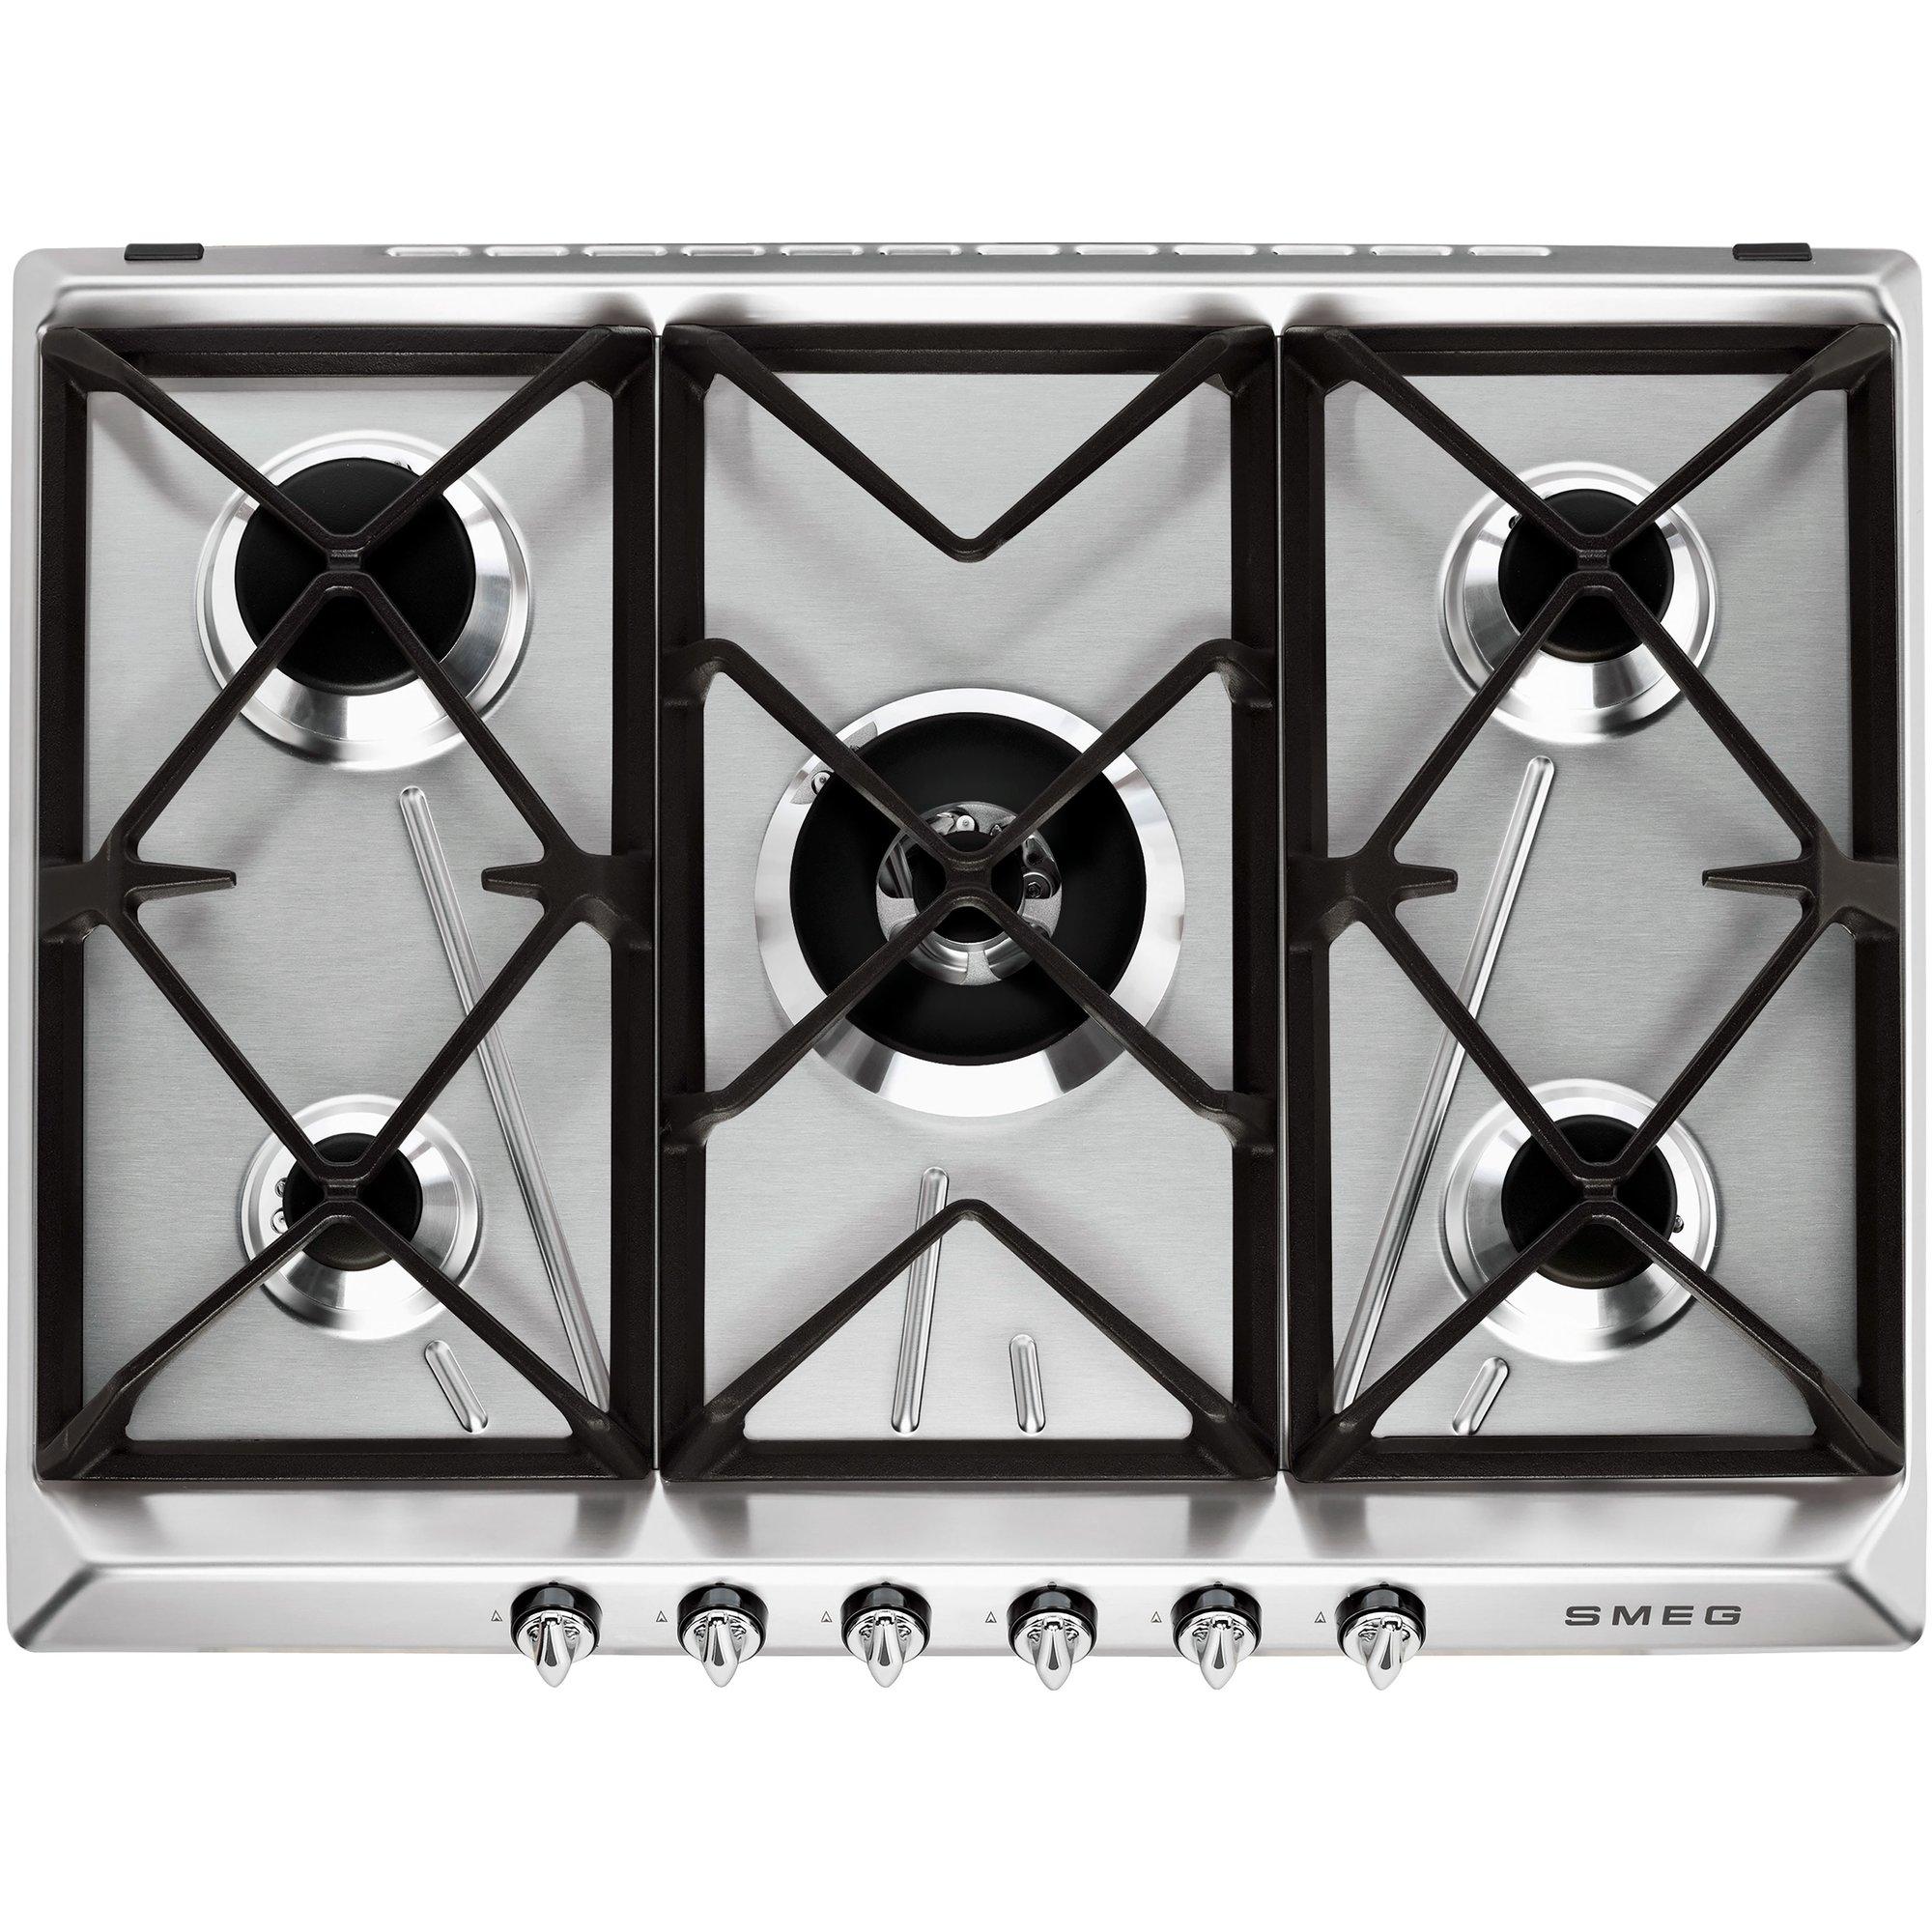 Smeg 685 cm gashäll rostfritt stål Victoria design